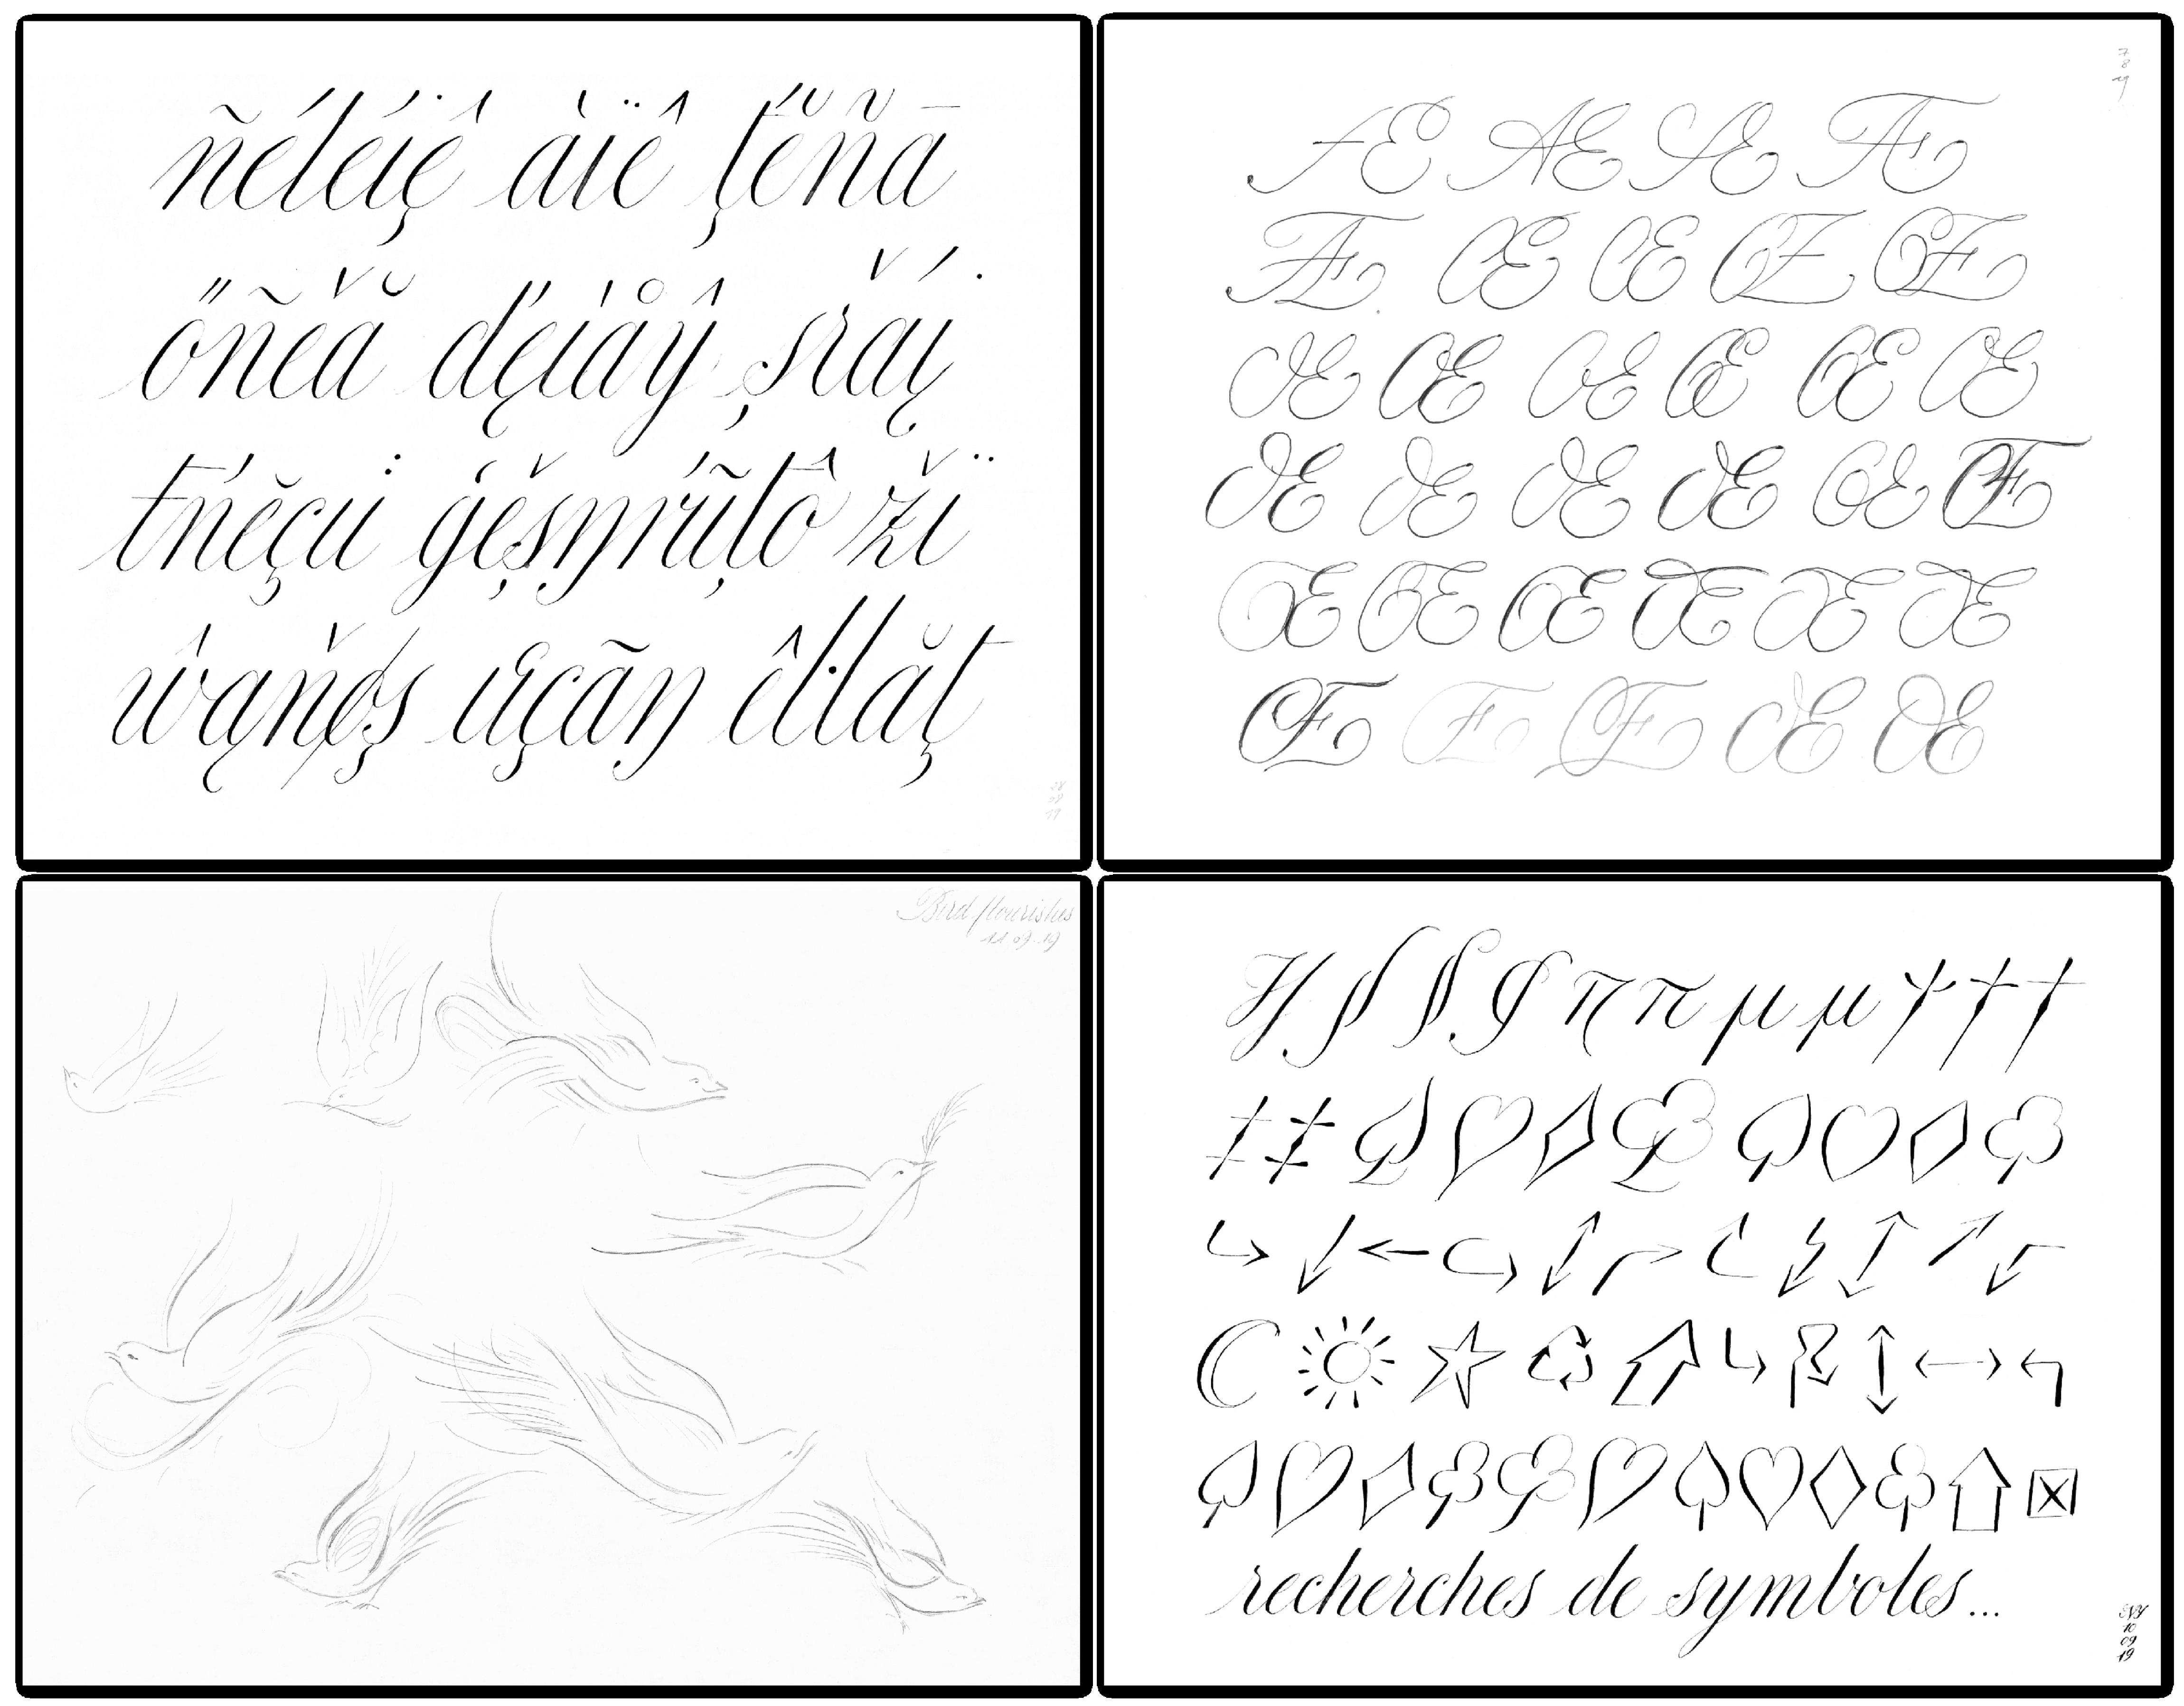 The Rare Cursive Typeface That Actually Recreates the Feel of Handwritten Script